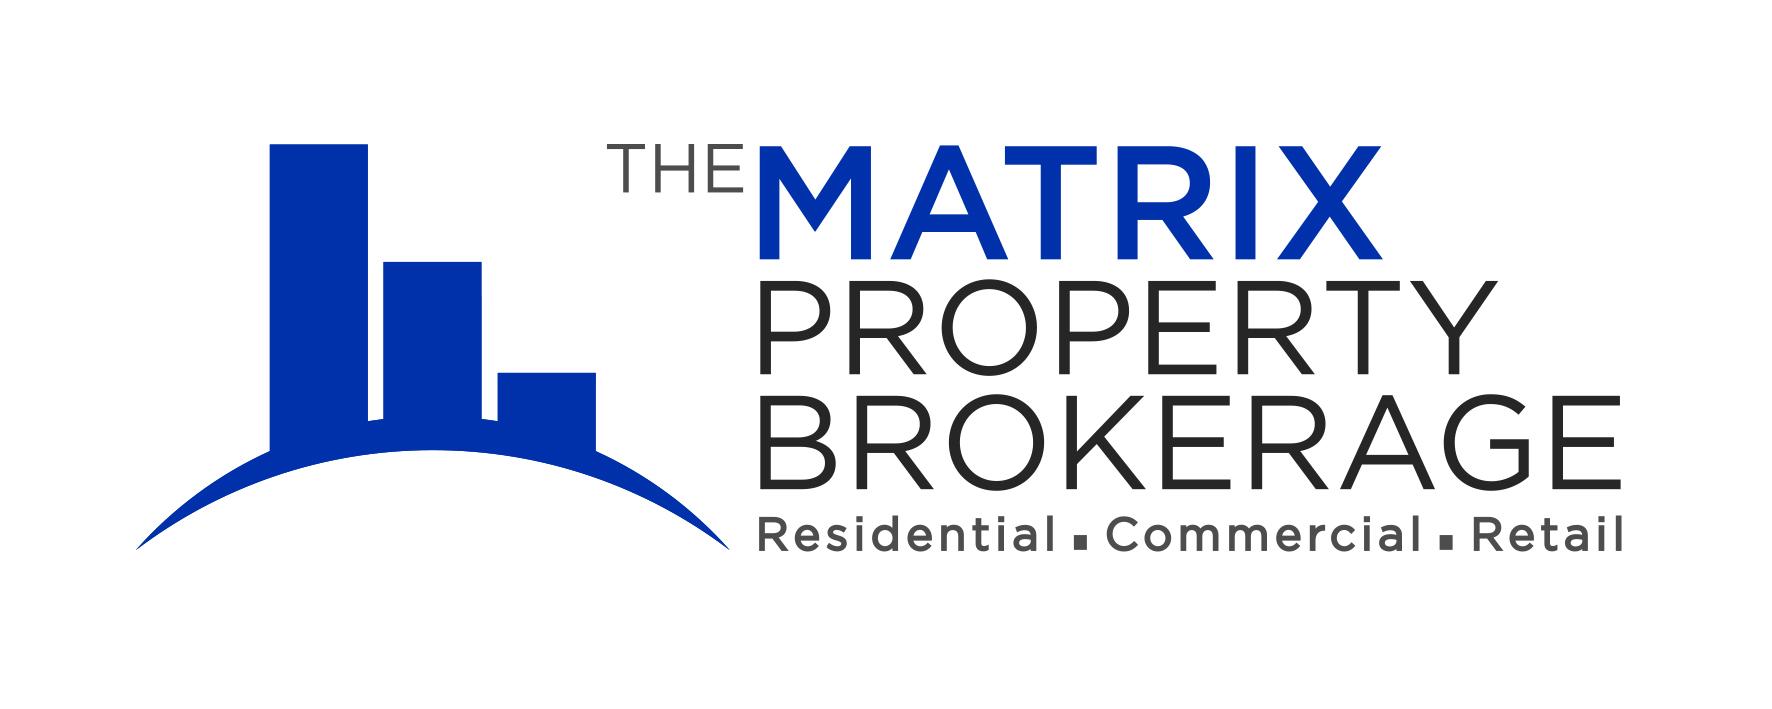 The Matrix Property Brokerage